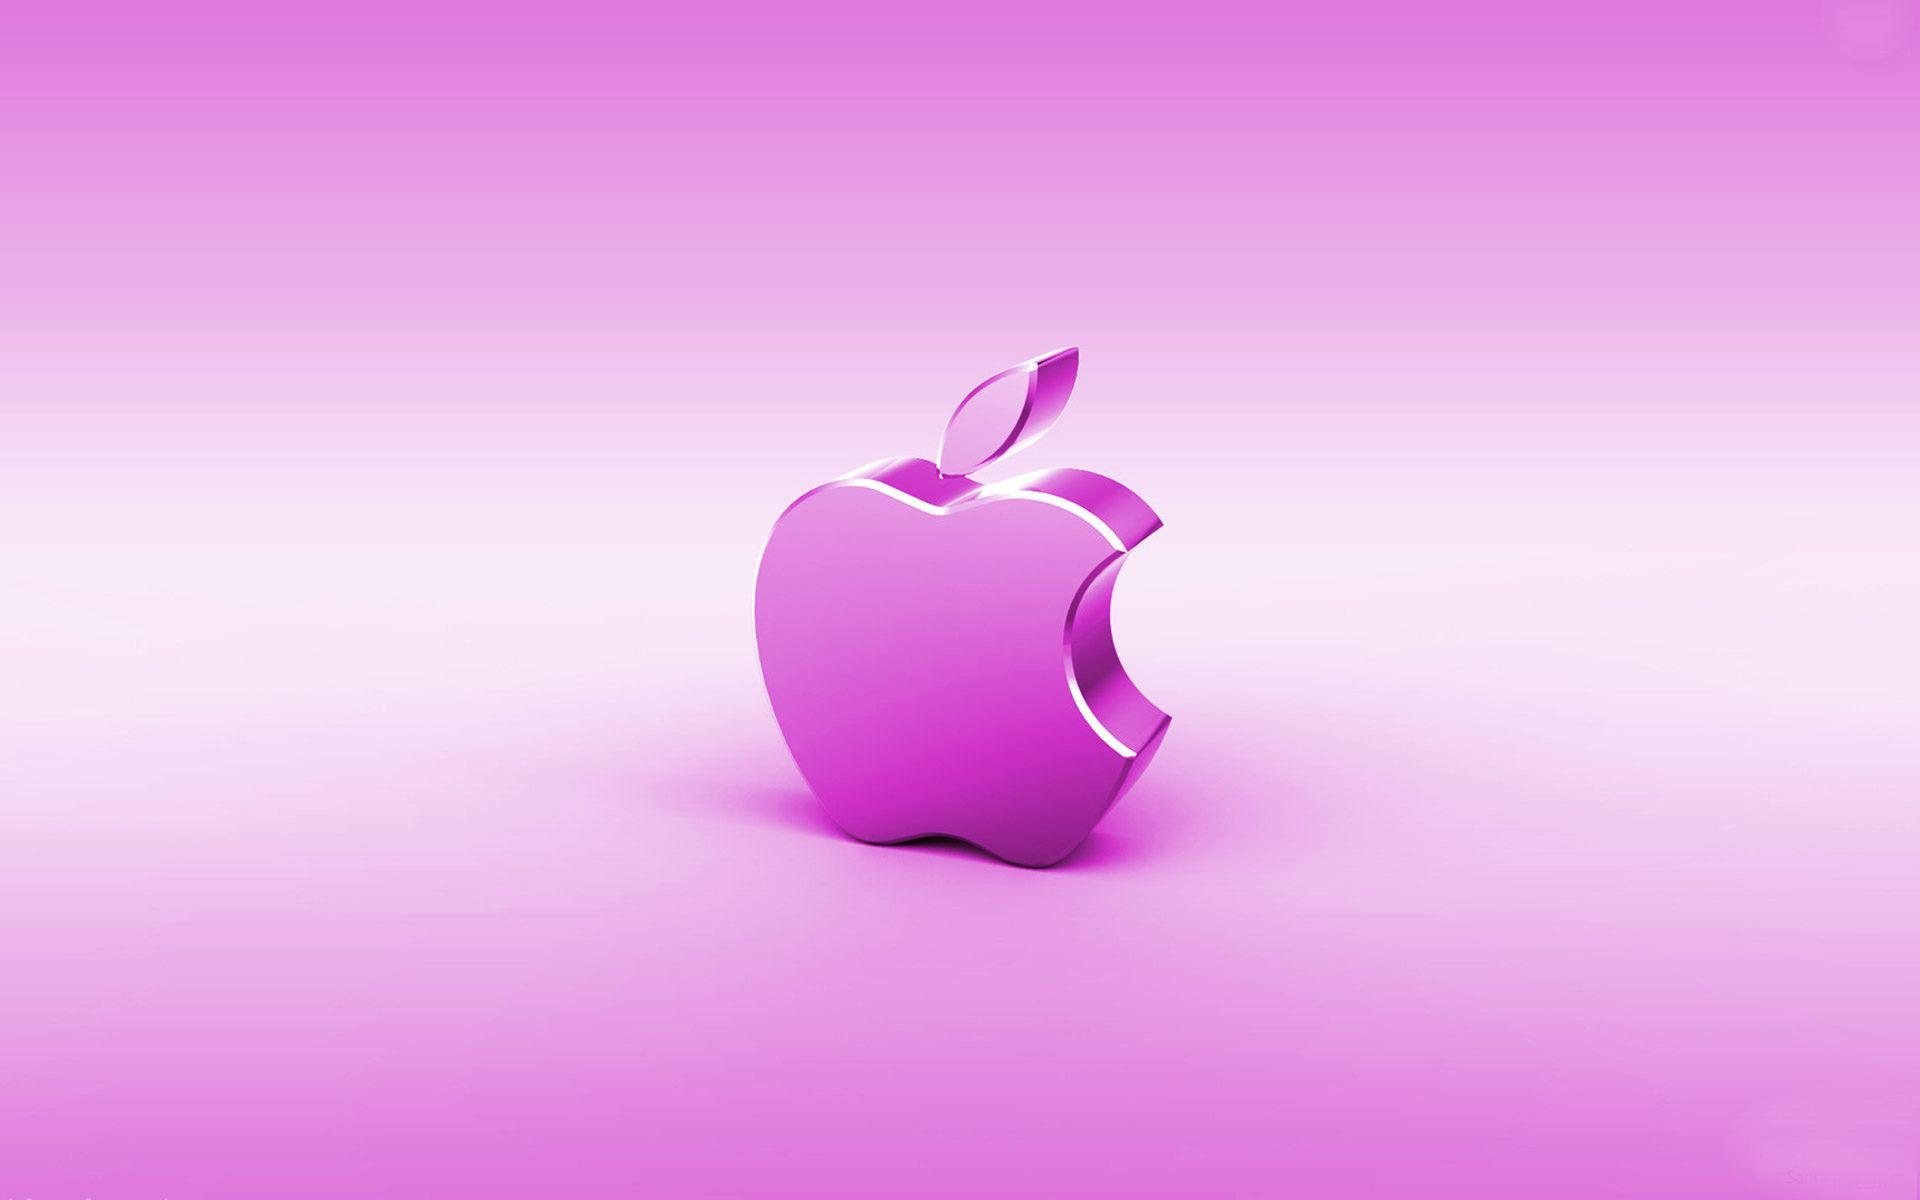 Hot Pink Apple Wallpaper Pink apple wal 1920x1200